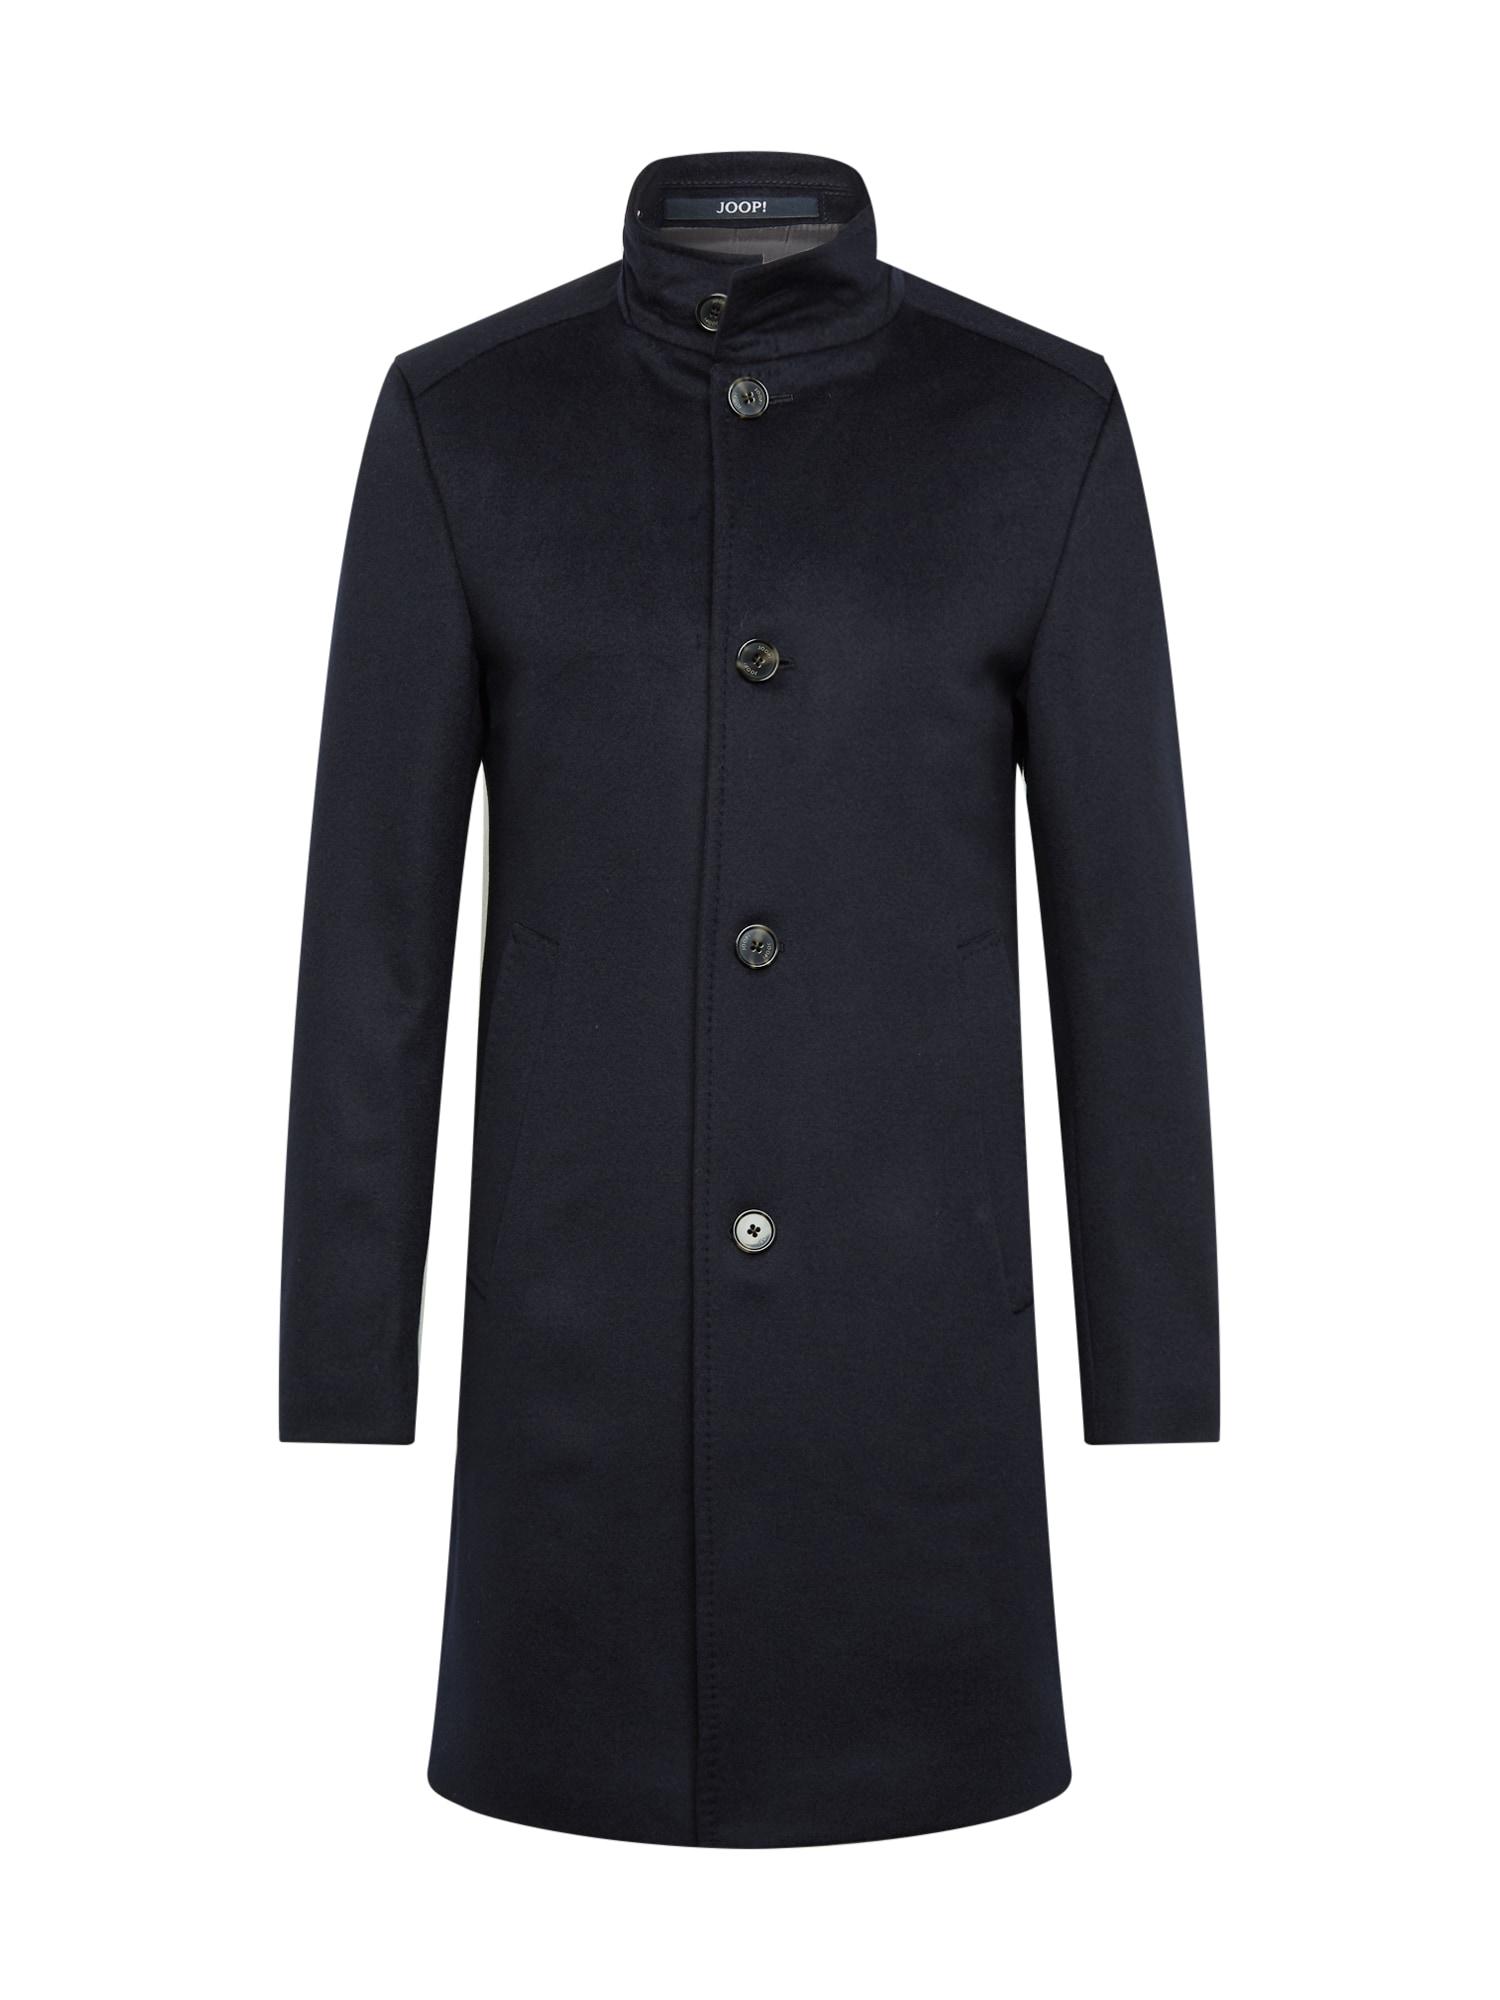 Zimní kabát 17 JC-21Maron 10001790 noční modrá JOOP!